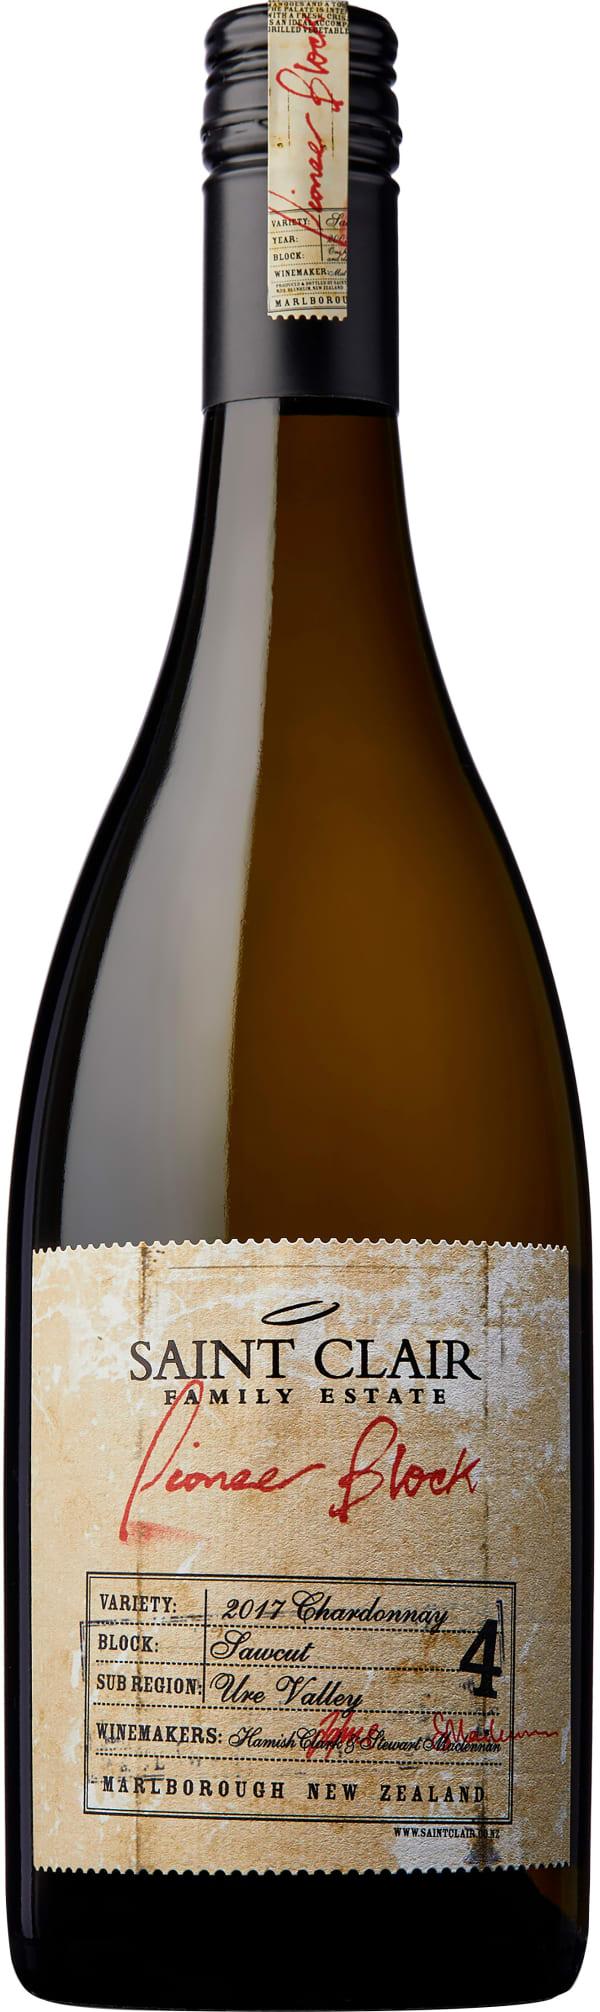 Saint Clair Pioneer Block Sawcut Chardonnay 2017